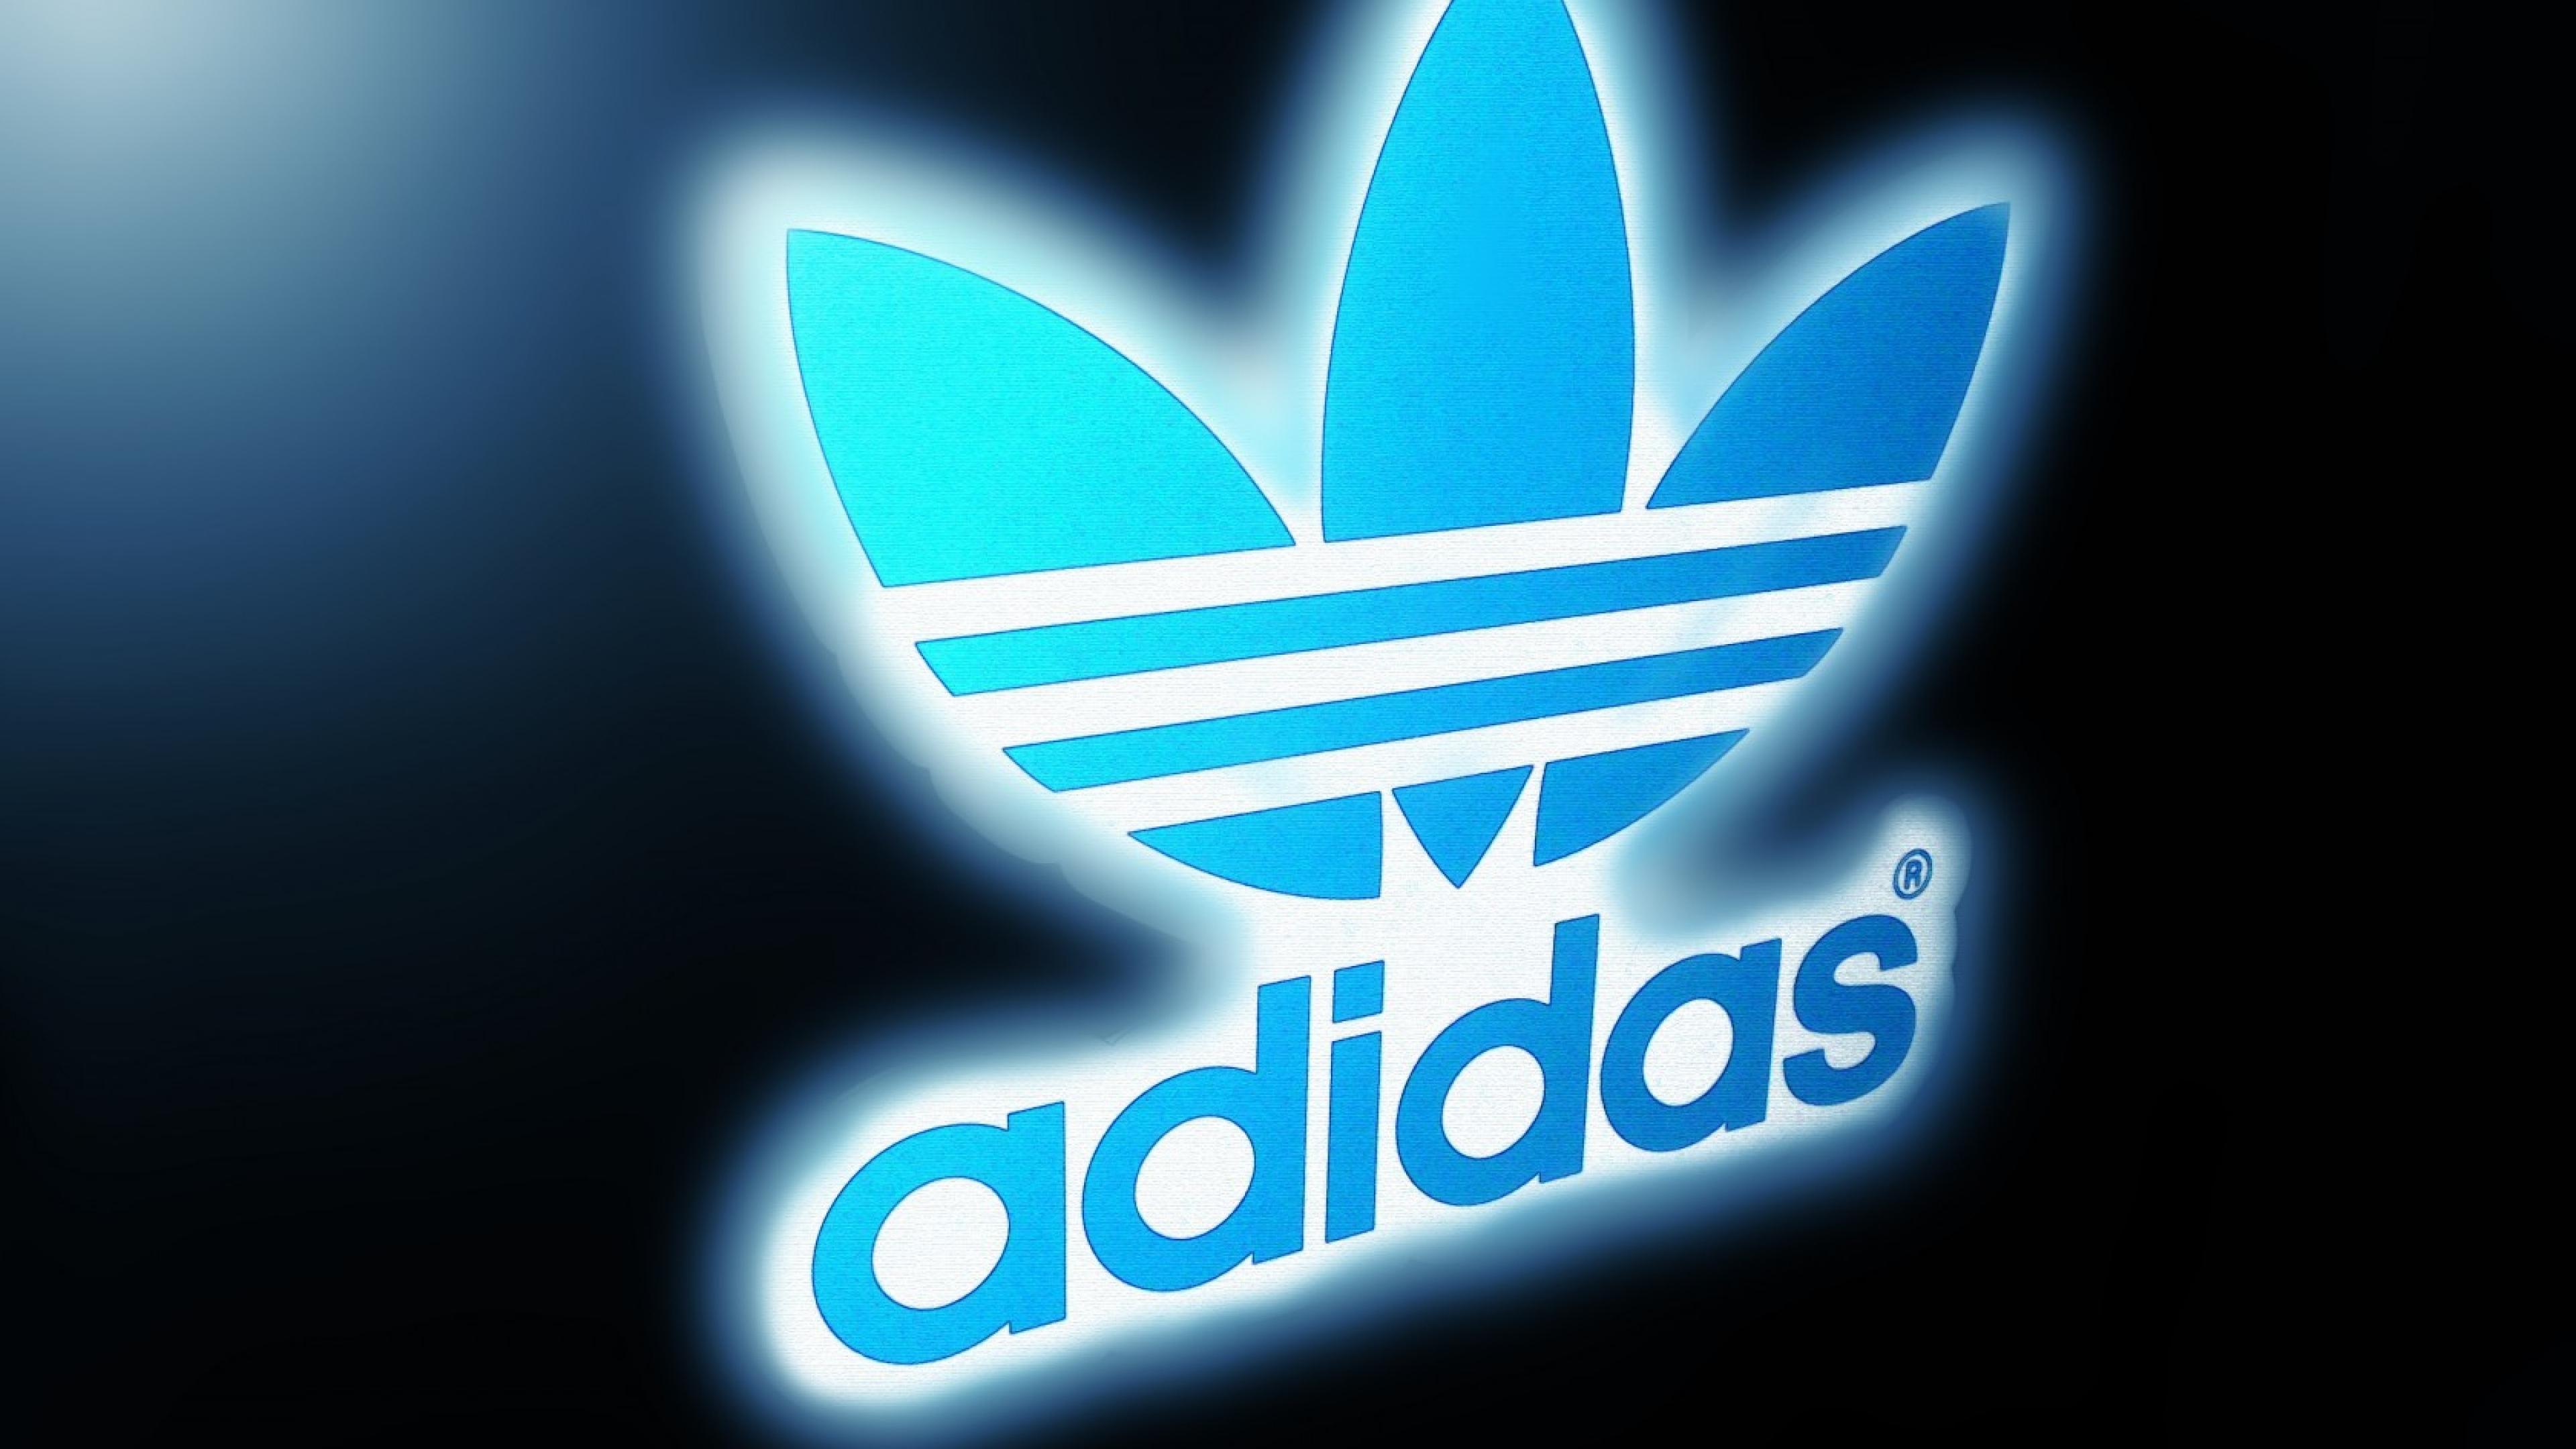 296d1cc0d49d Adidas Wallpapers High Quality Download 3840x2160